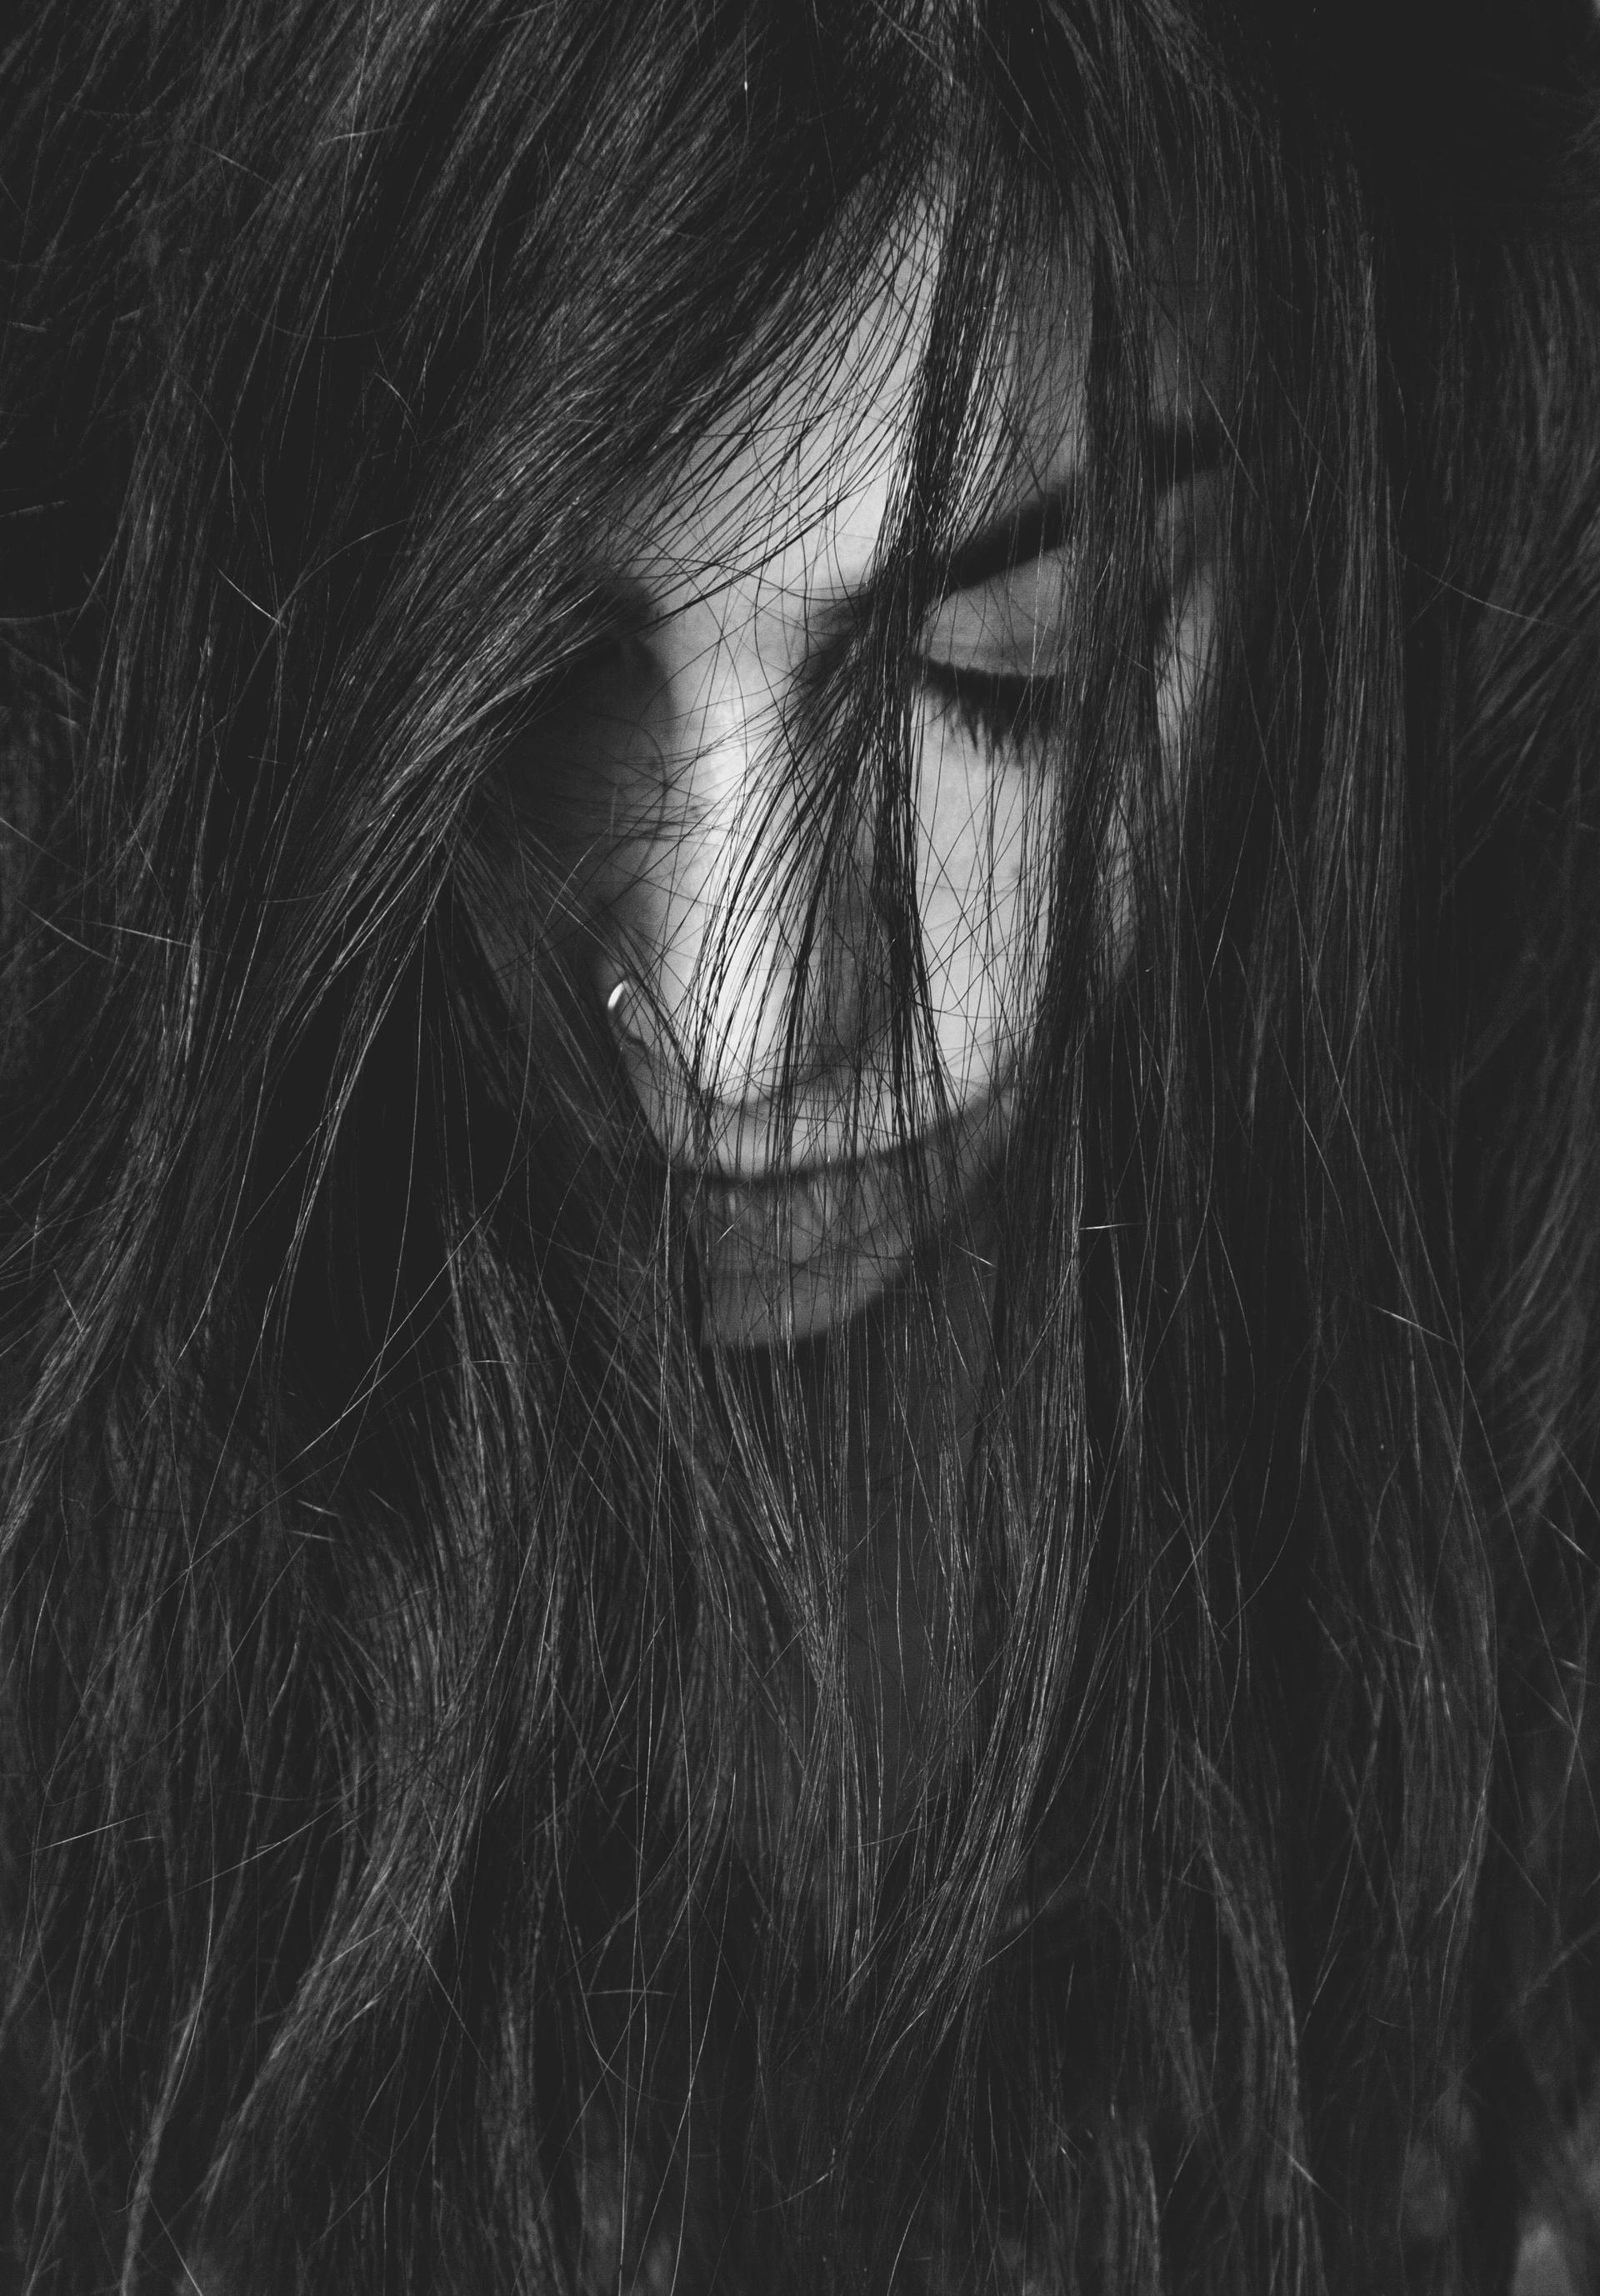 woman black and white portrait